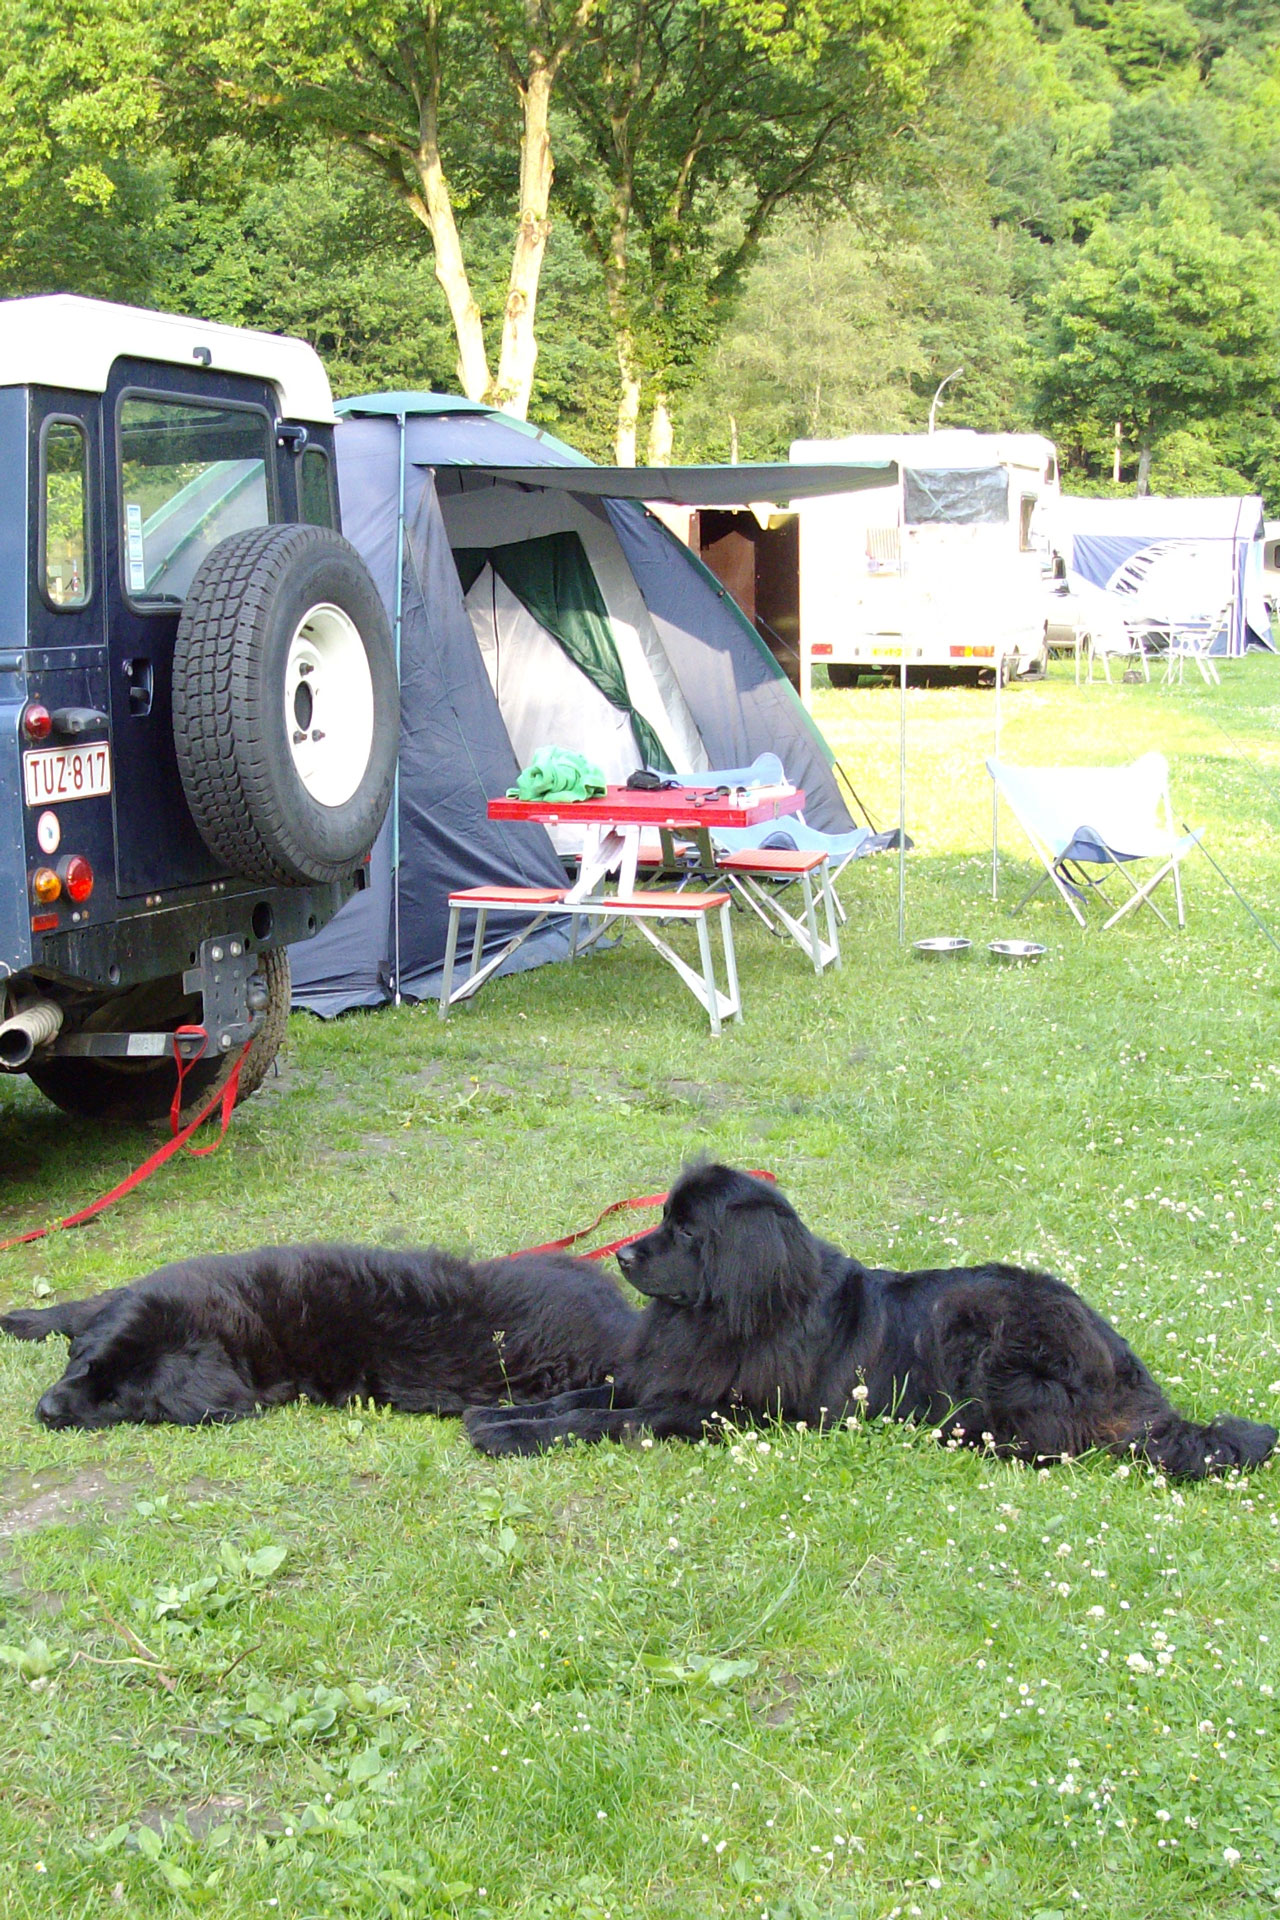 Chiens - Camping Kautenbach